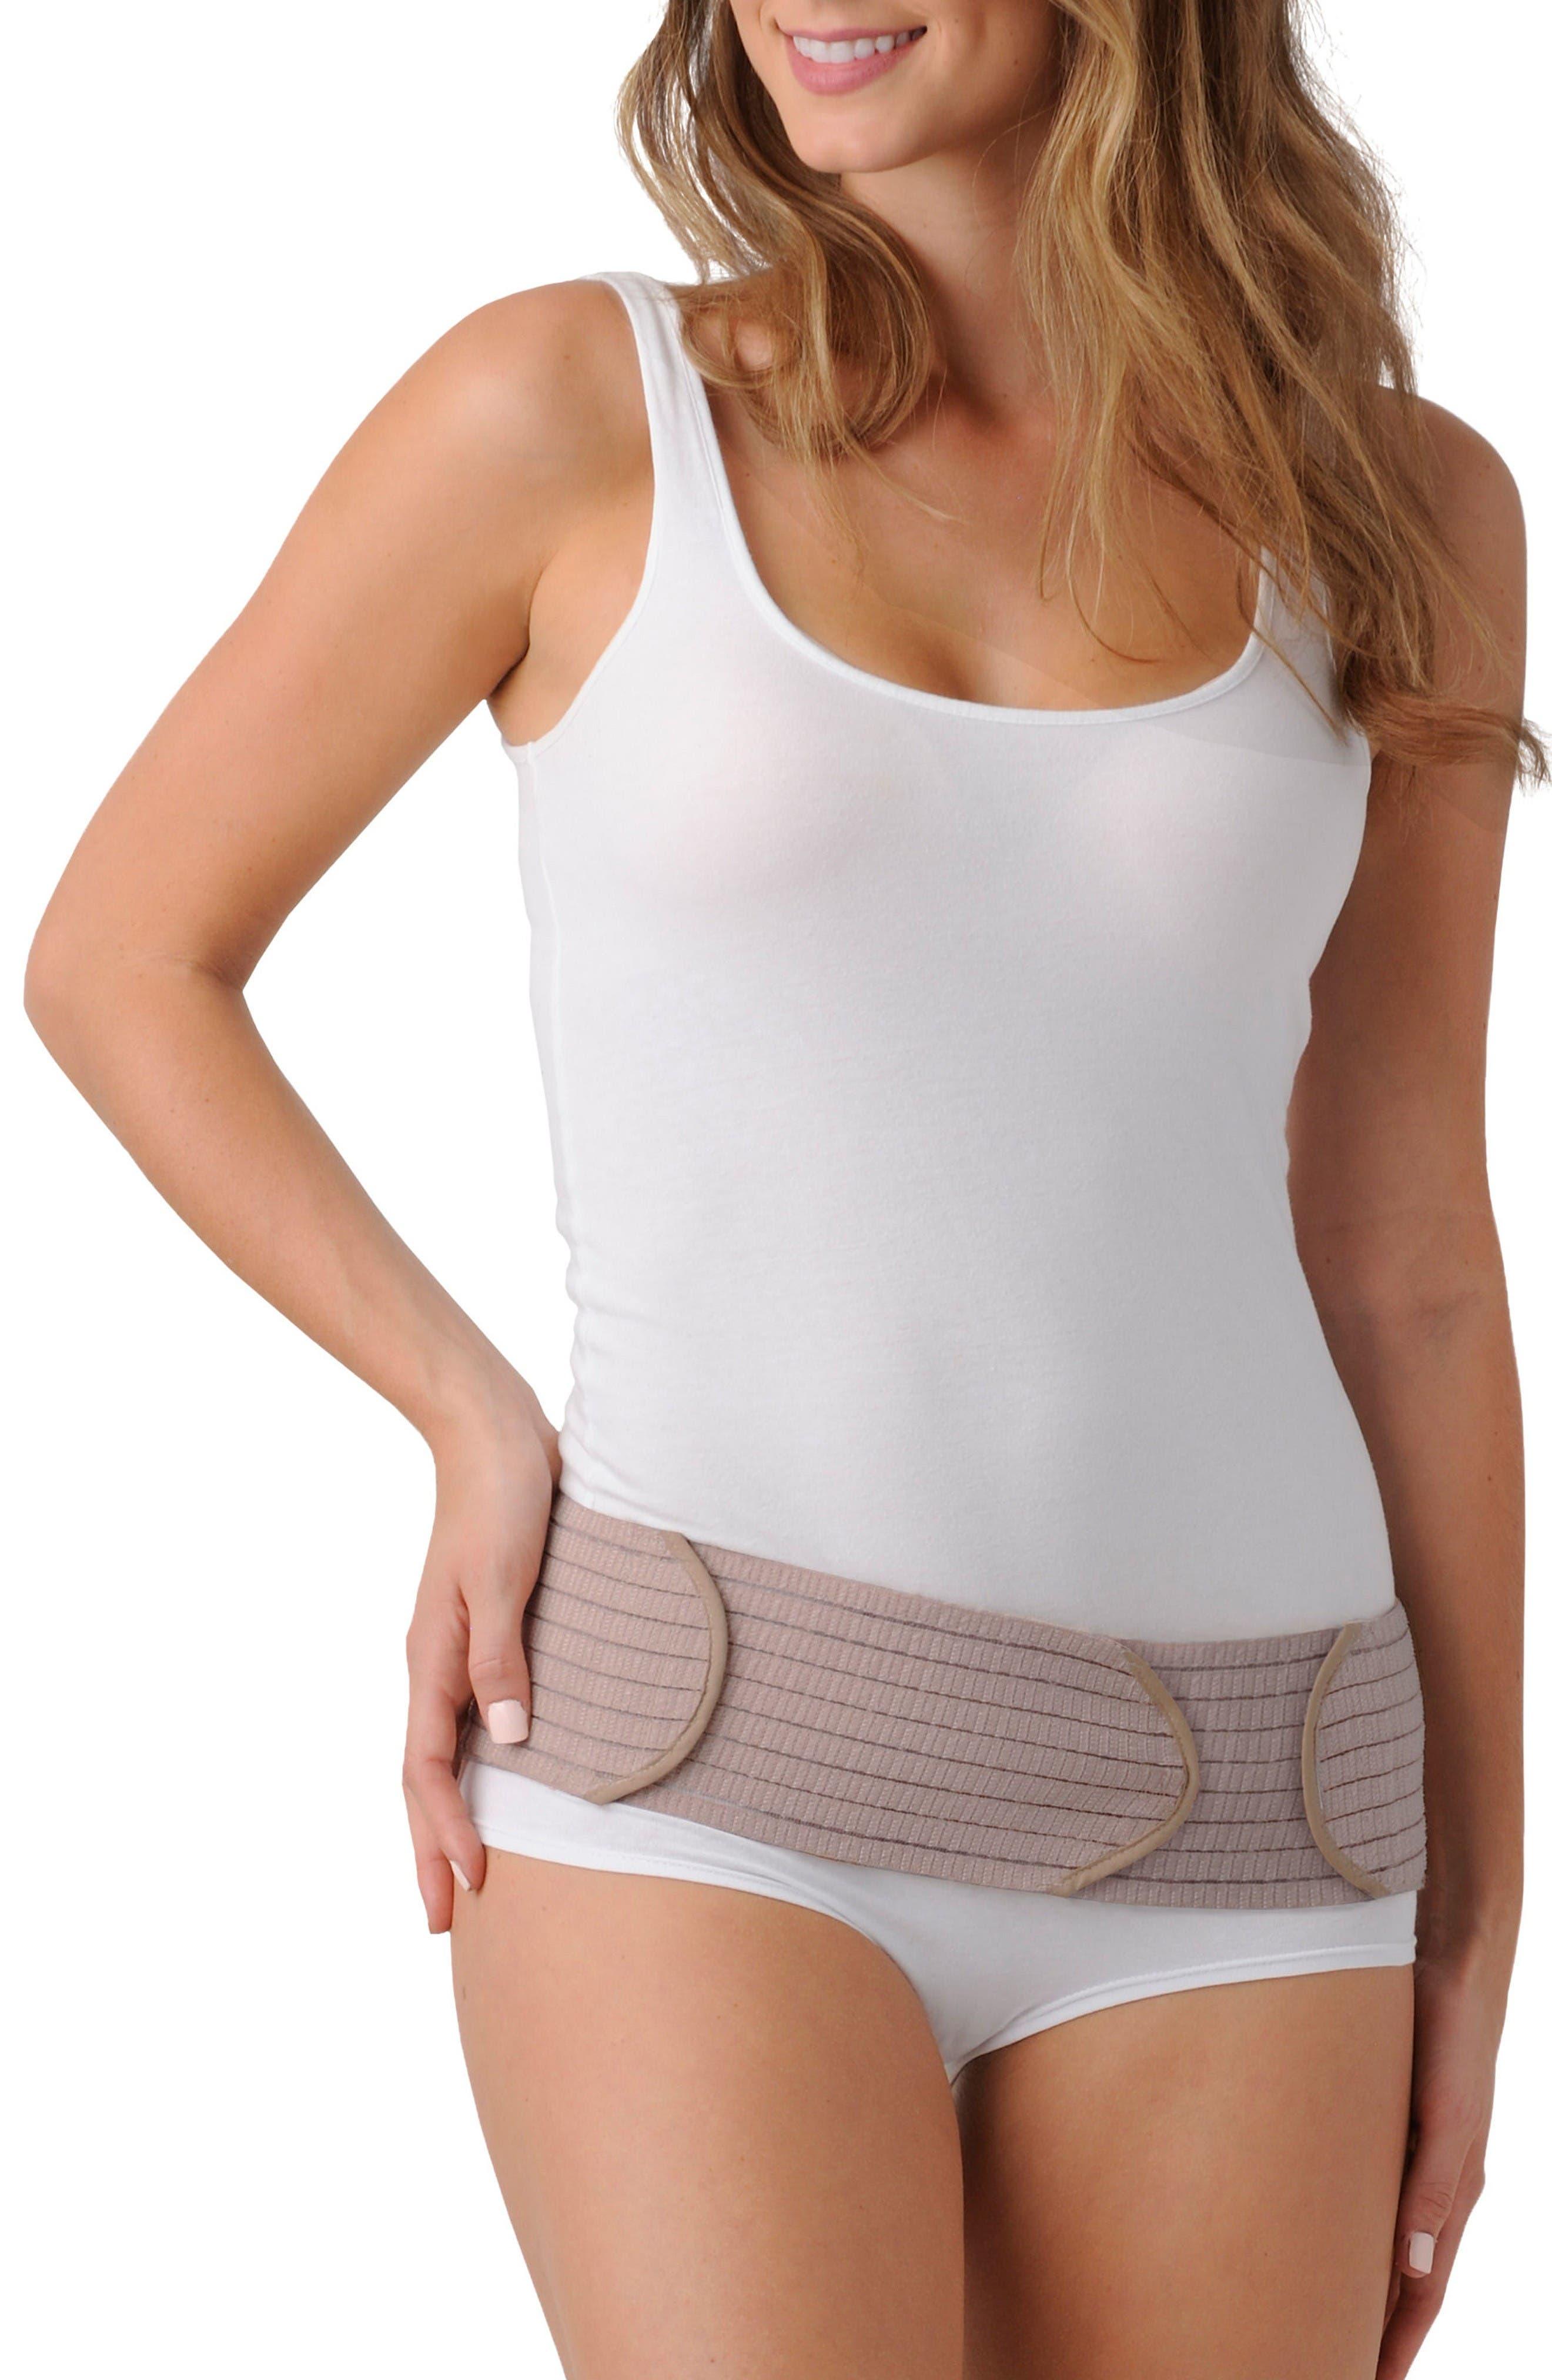 Belly Bandit® 2-in-1 Pregnancy & Post Pregnancy Belly Wrap